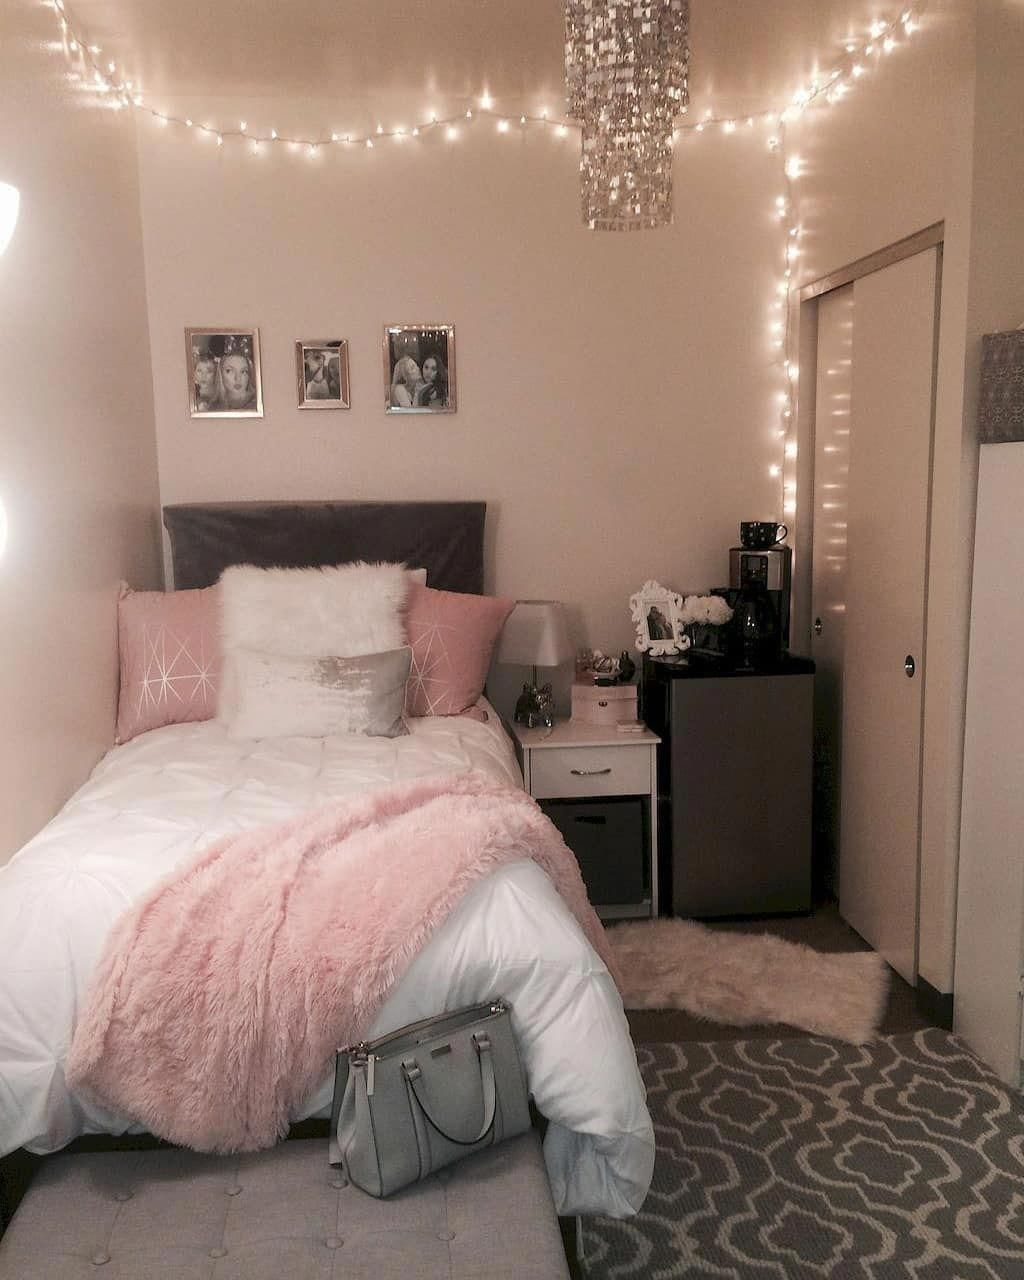 diy bedroom decorating ideas budget - simple bedroom decor ...